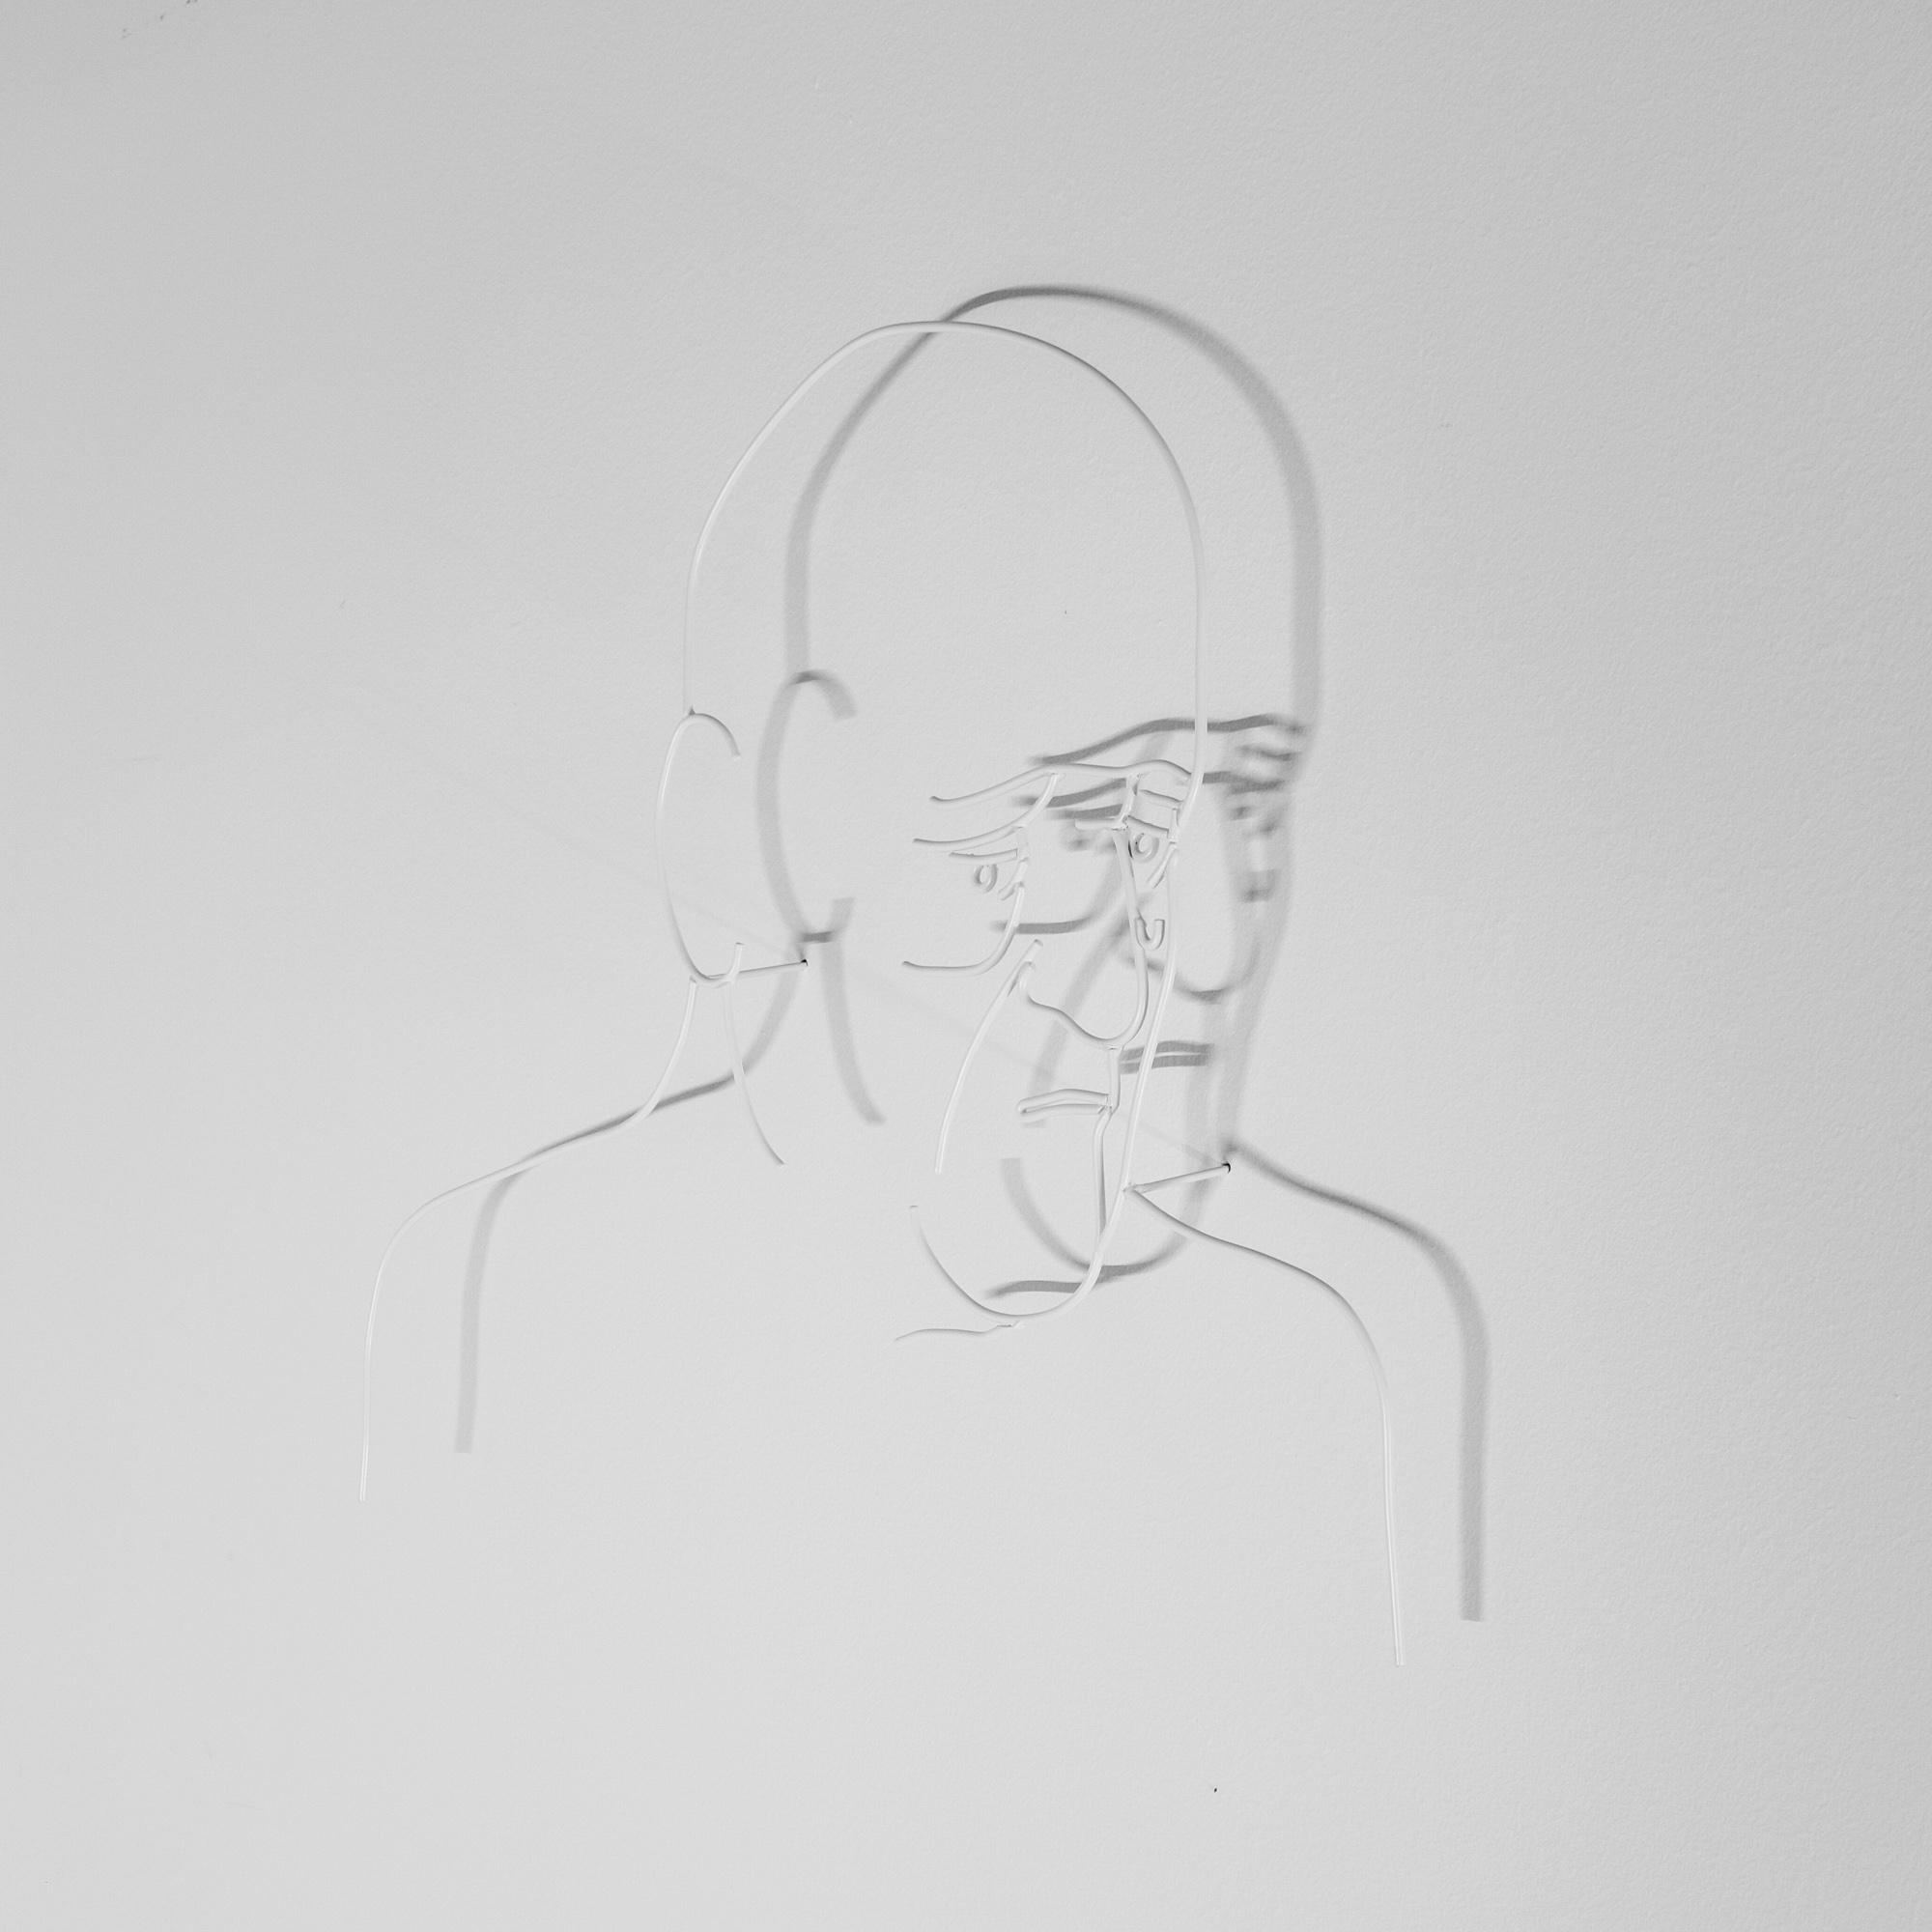 emil-taschka-so-long-old-man-03